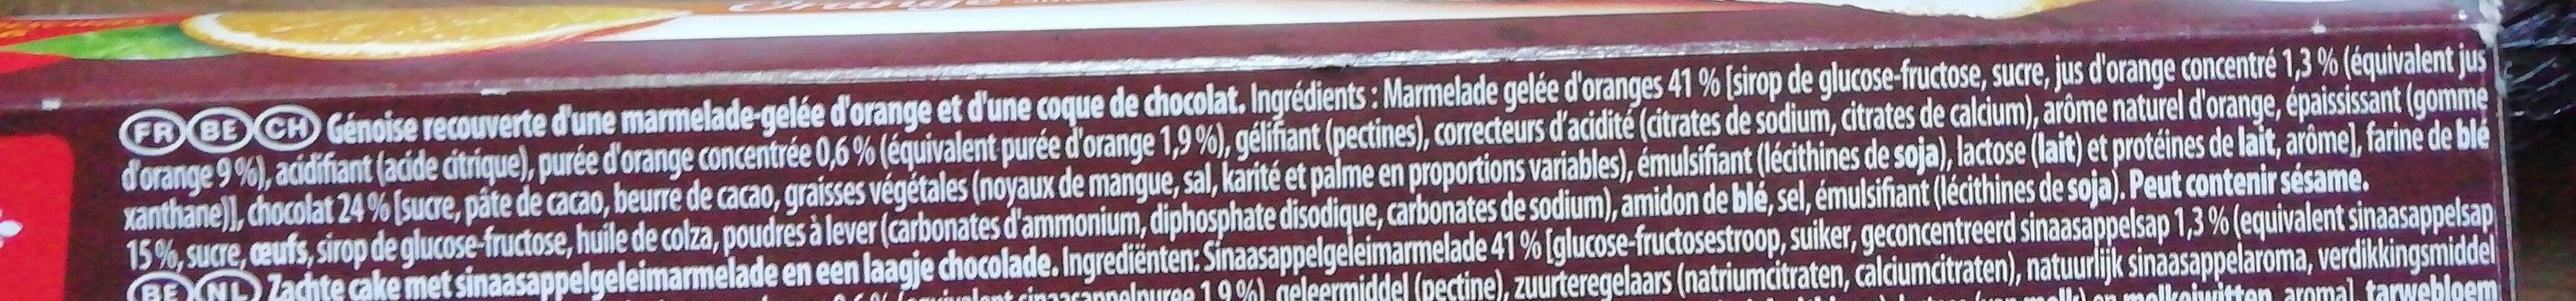 Pim's L'Original Orange - Ingredients - fr